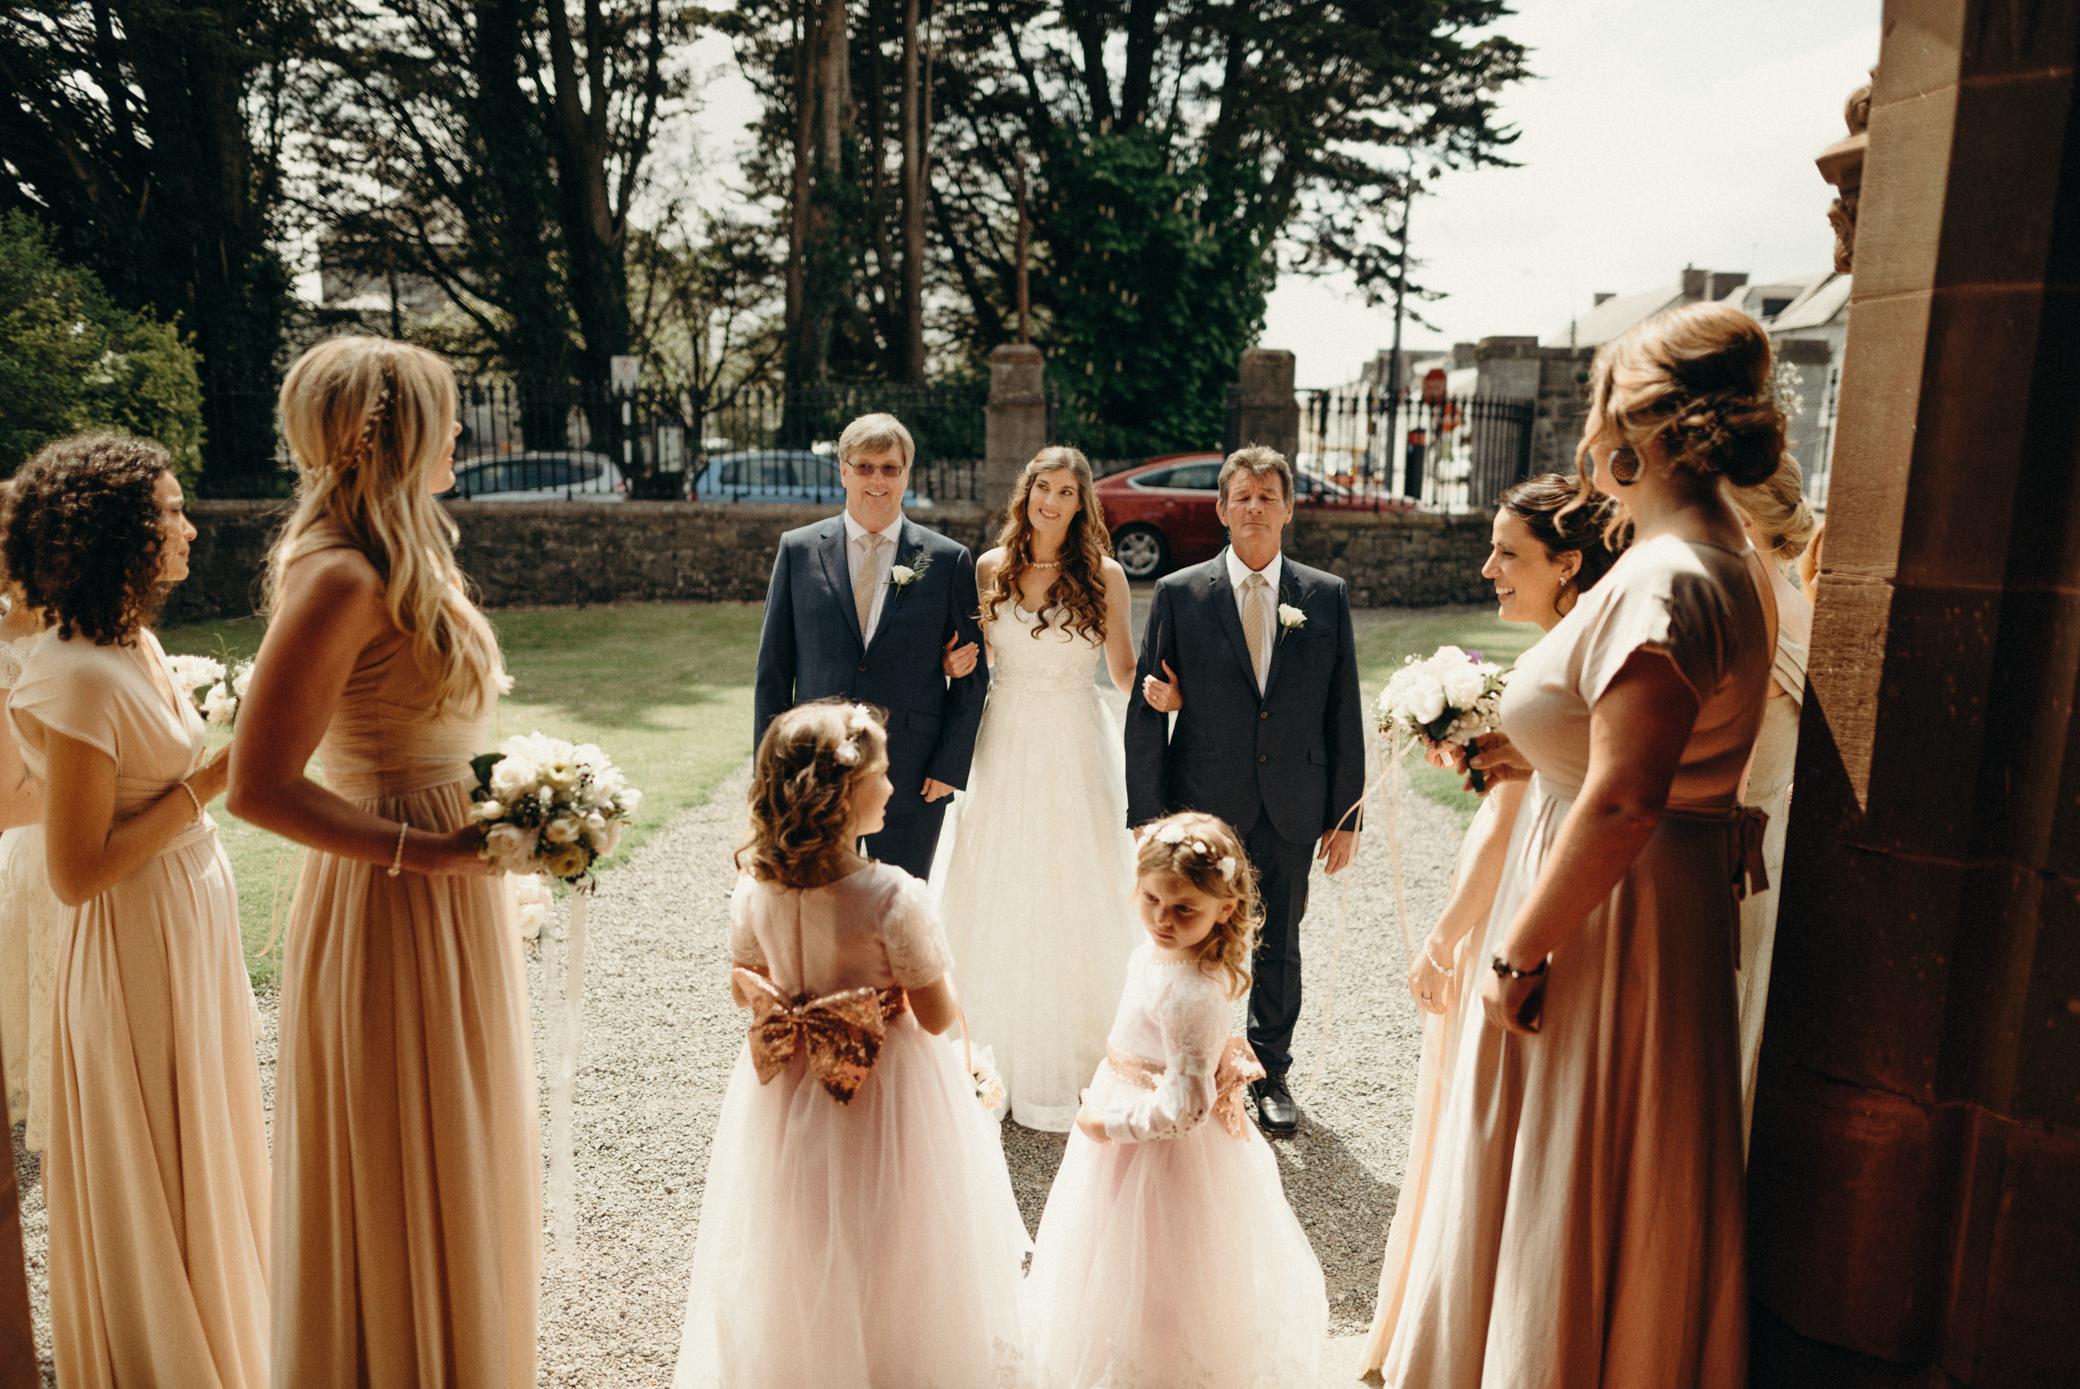 Castletown House - Celbridge Manor Hotel Wedding - Elopement Ireland-80.jpg